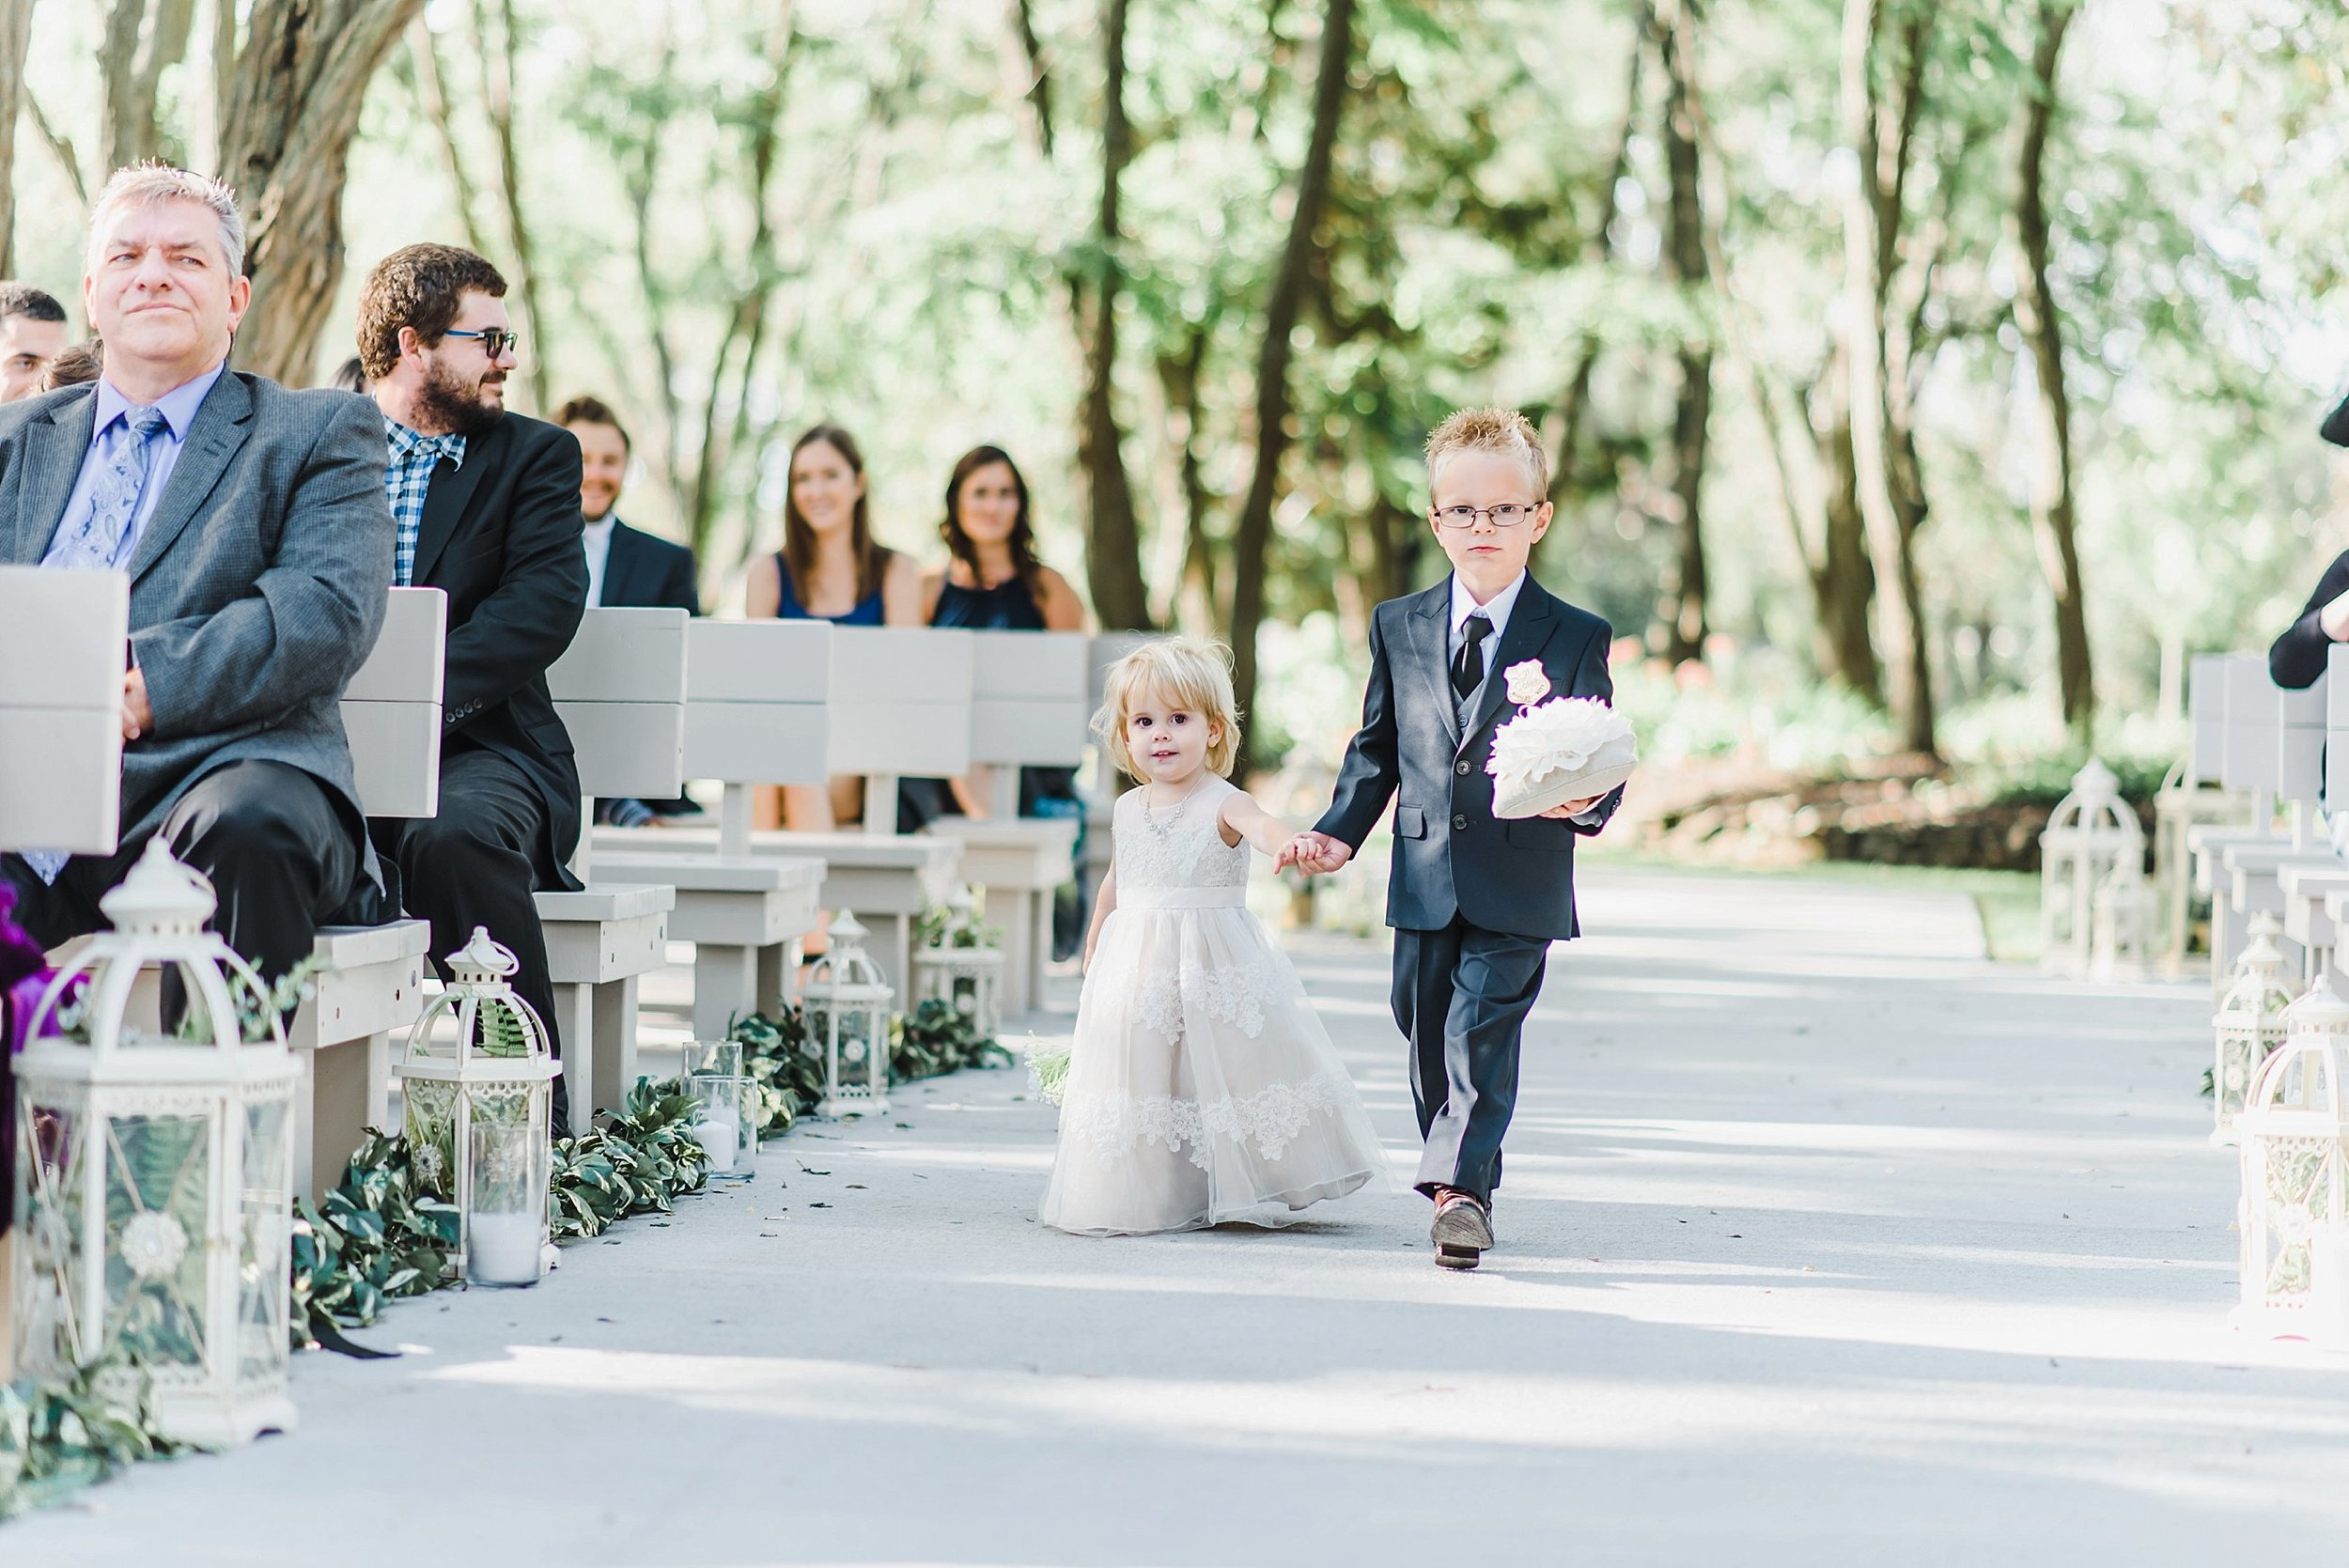 light airy indie fine art ottawa wedding photographer | Ali and Batoul Photography_1145.jpg